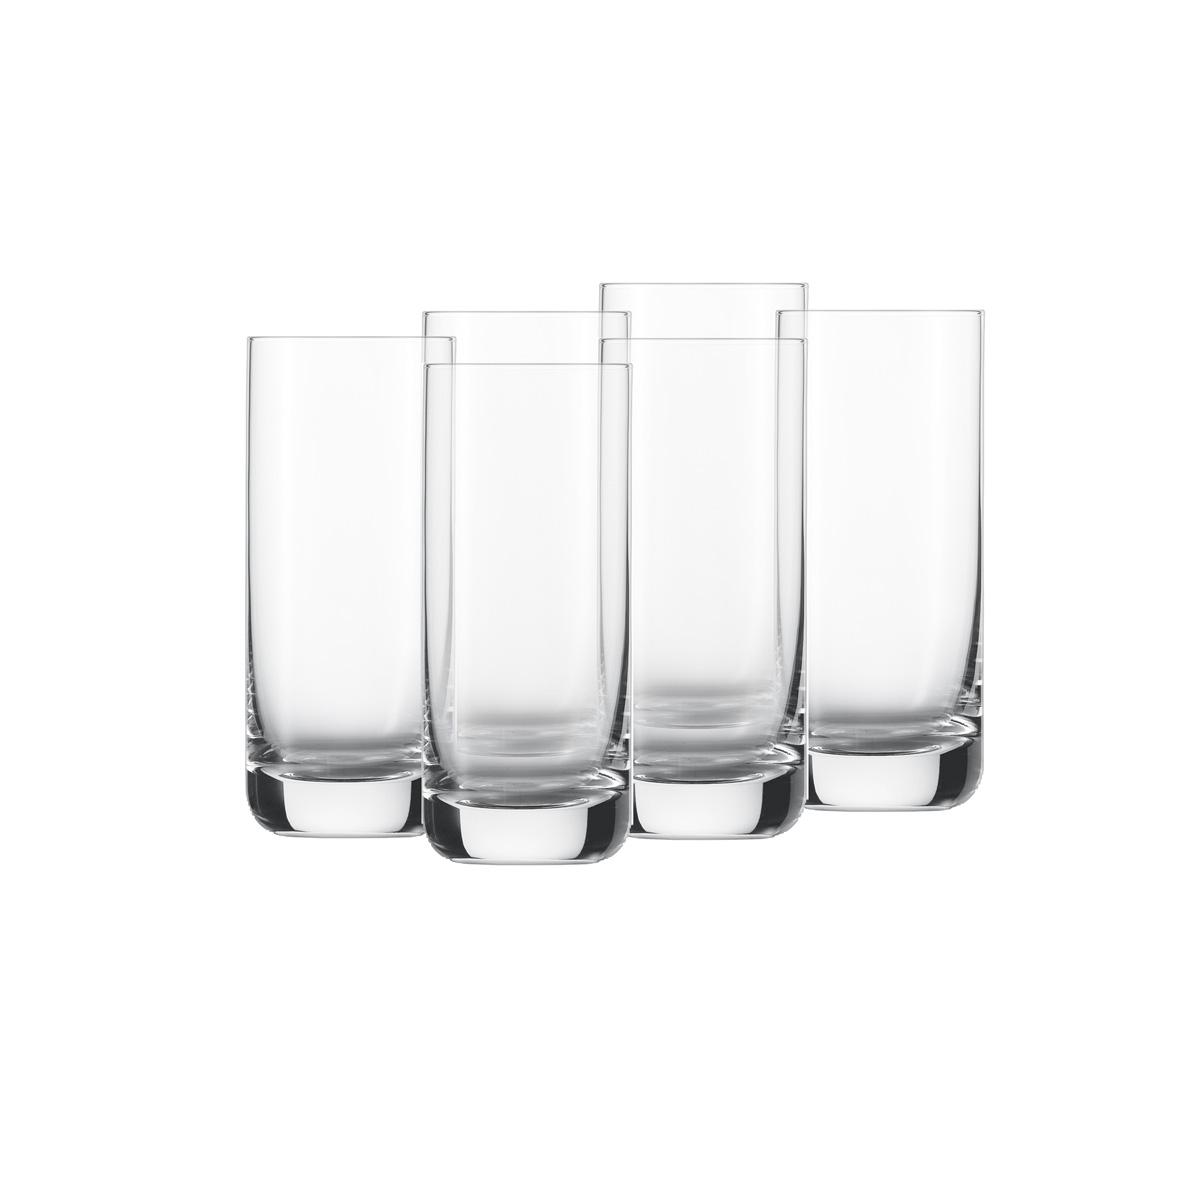 Онлайн каталог PROMENU: Набор стаканов Schott Zwiesel CONVENTION, объем 0,37 л, прозрачный, 6 штук Schott Zwiesel 118360